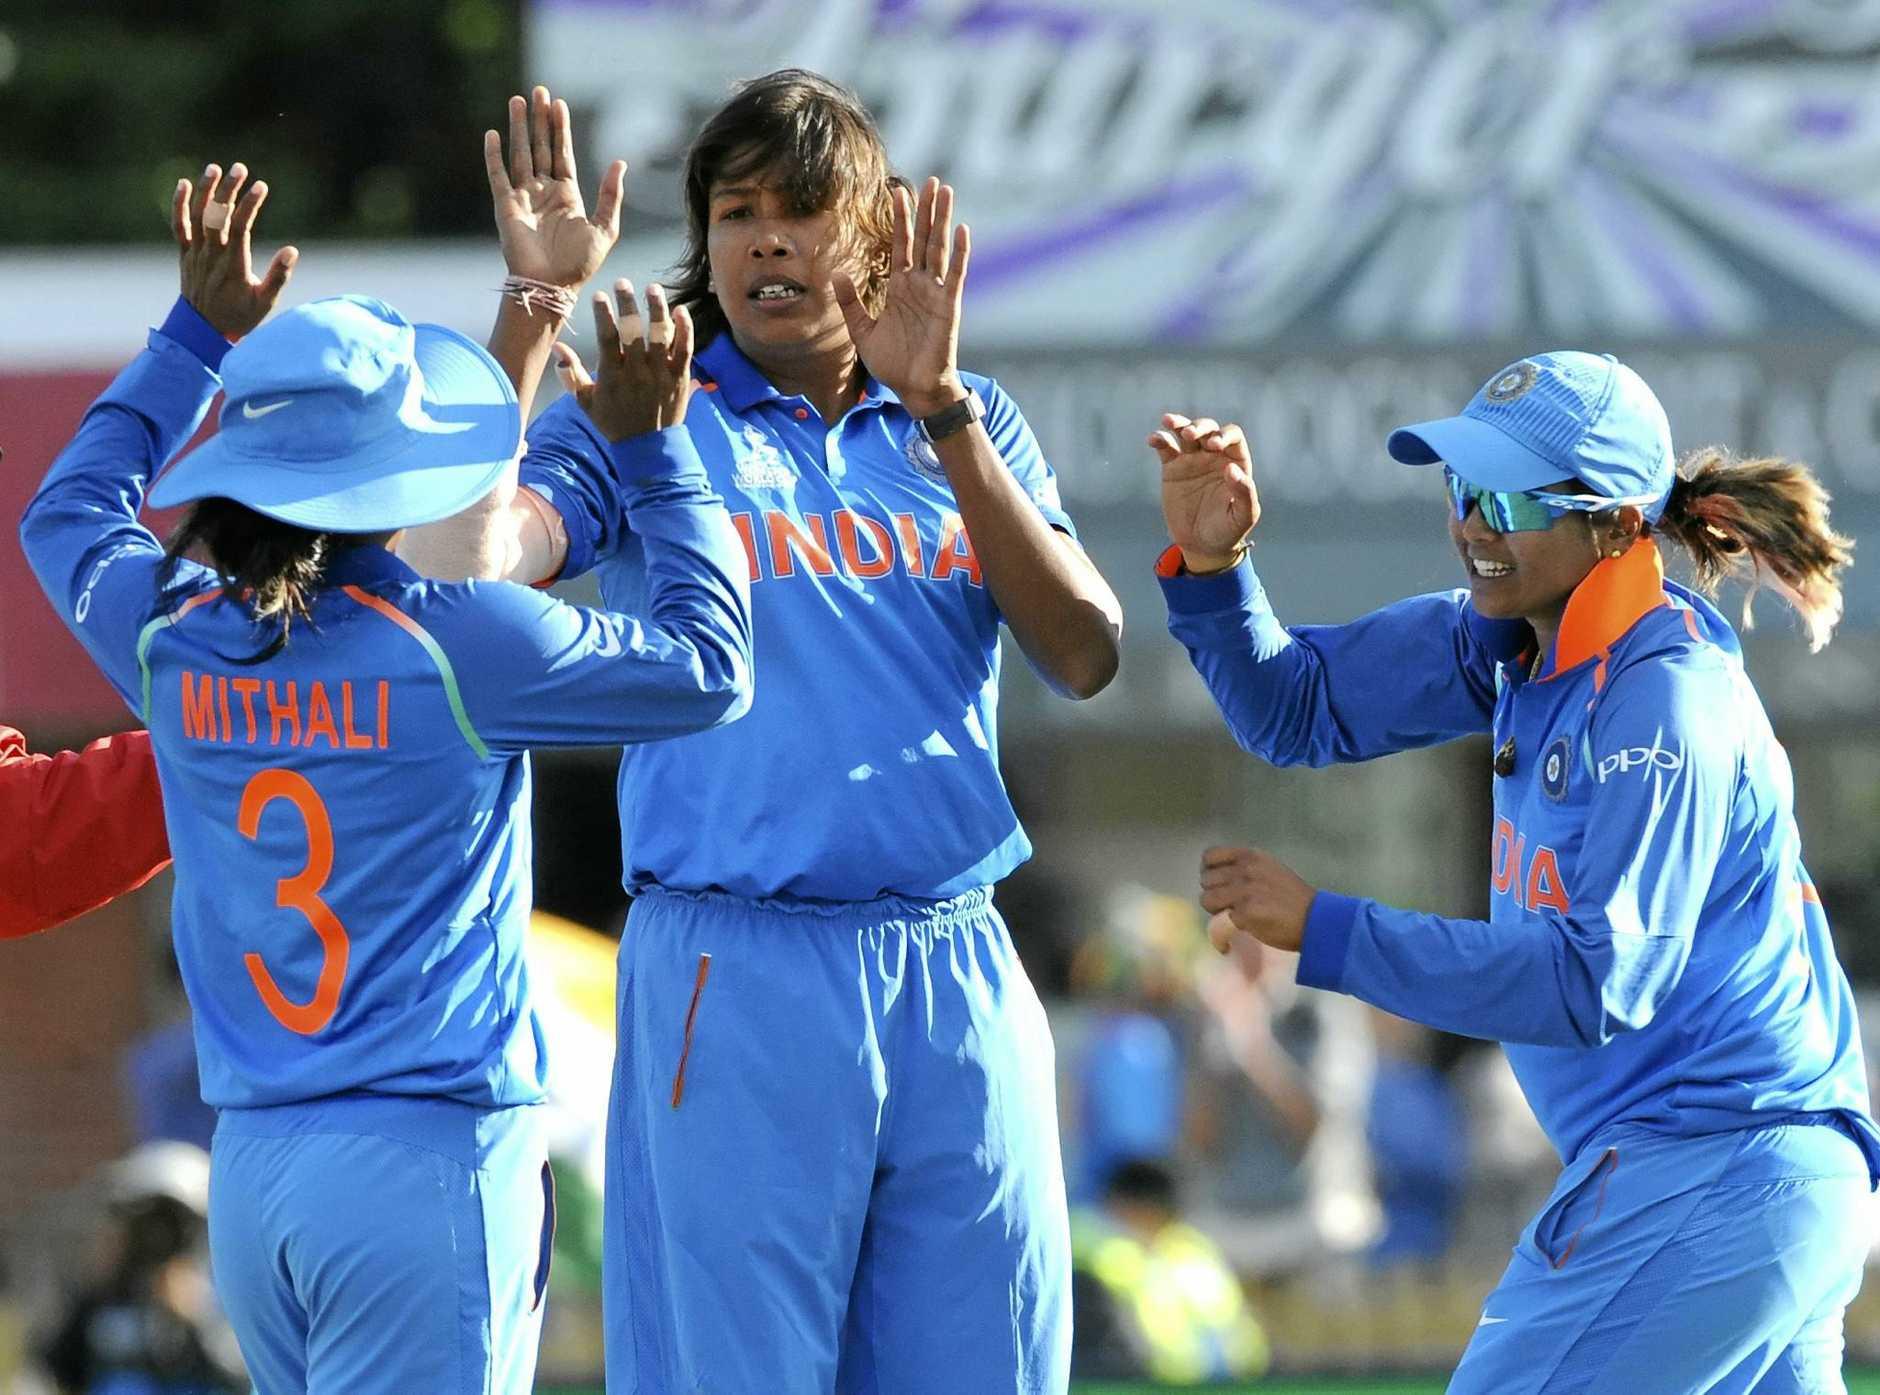 India's Jhulan Goswami, centre, celebrates after dismissing Australia's Alyssa Healy